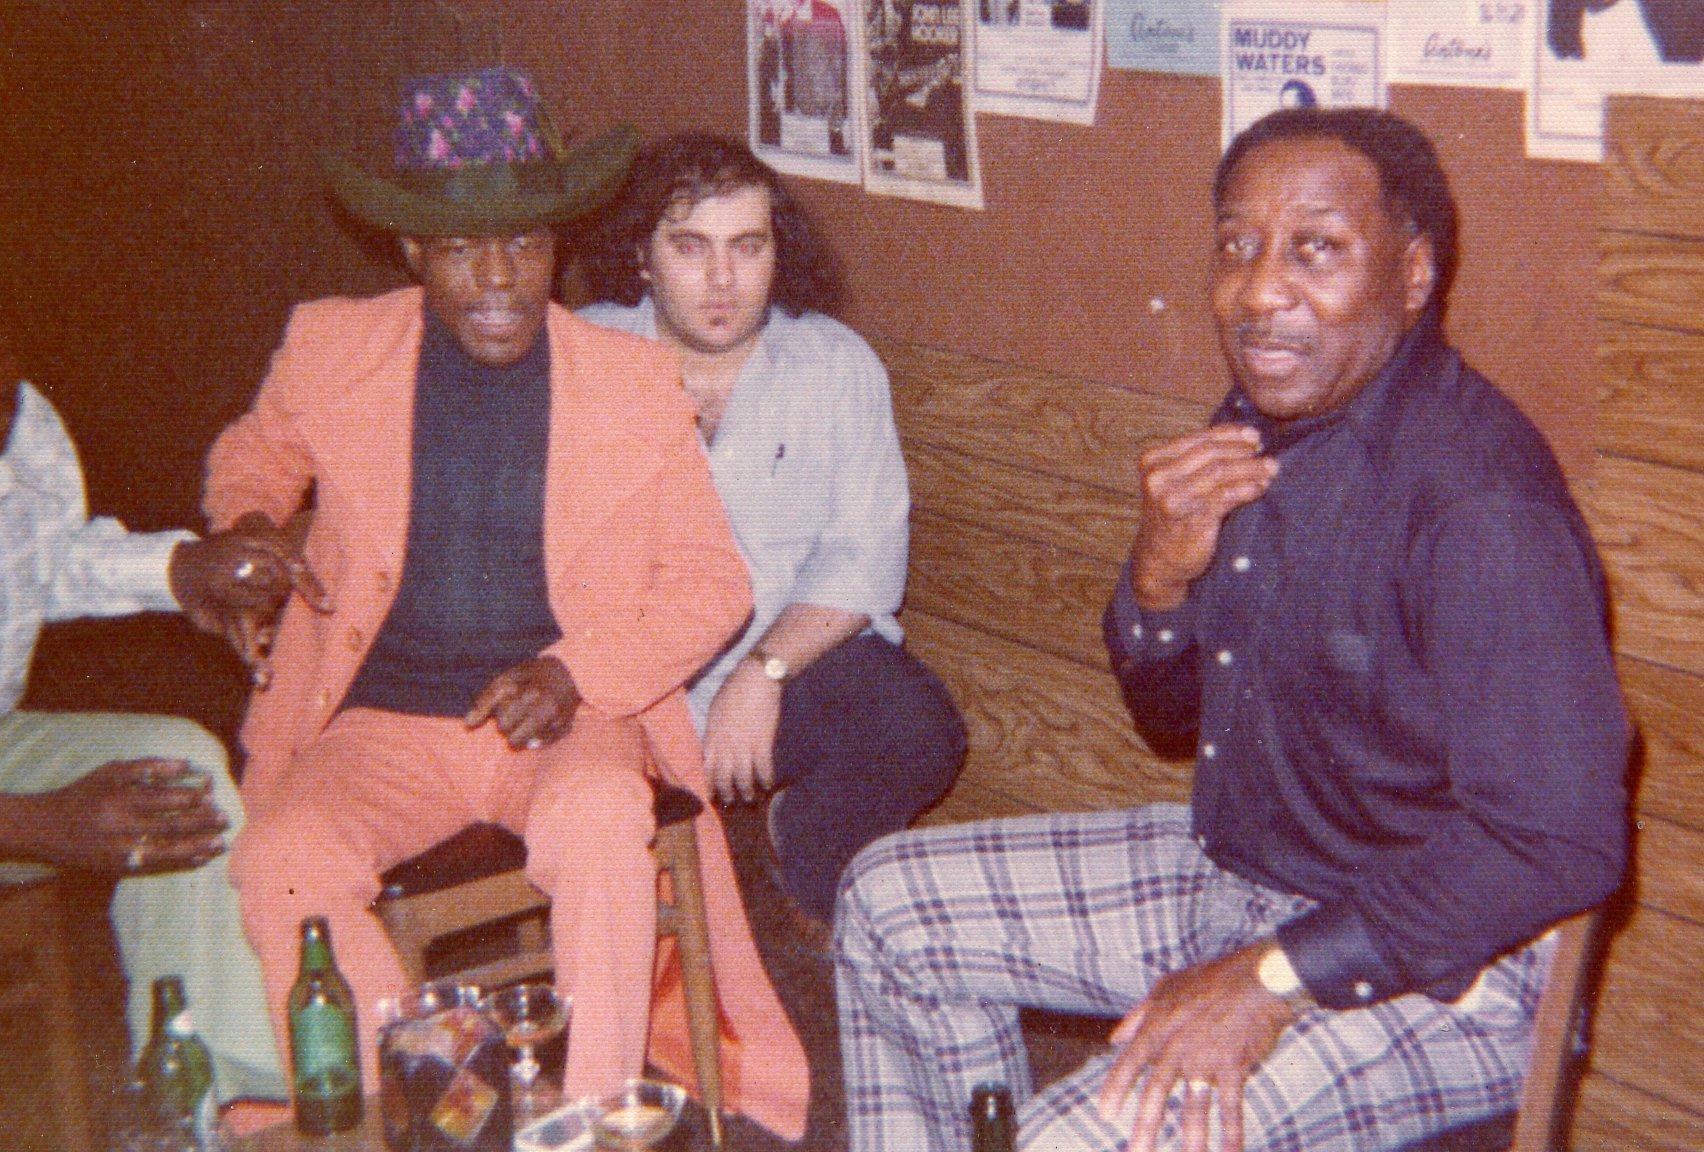 Antone, entre Junior Wells y Muddy Waters